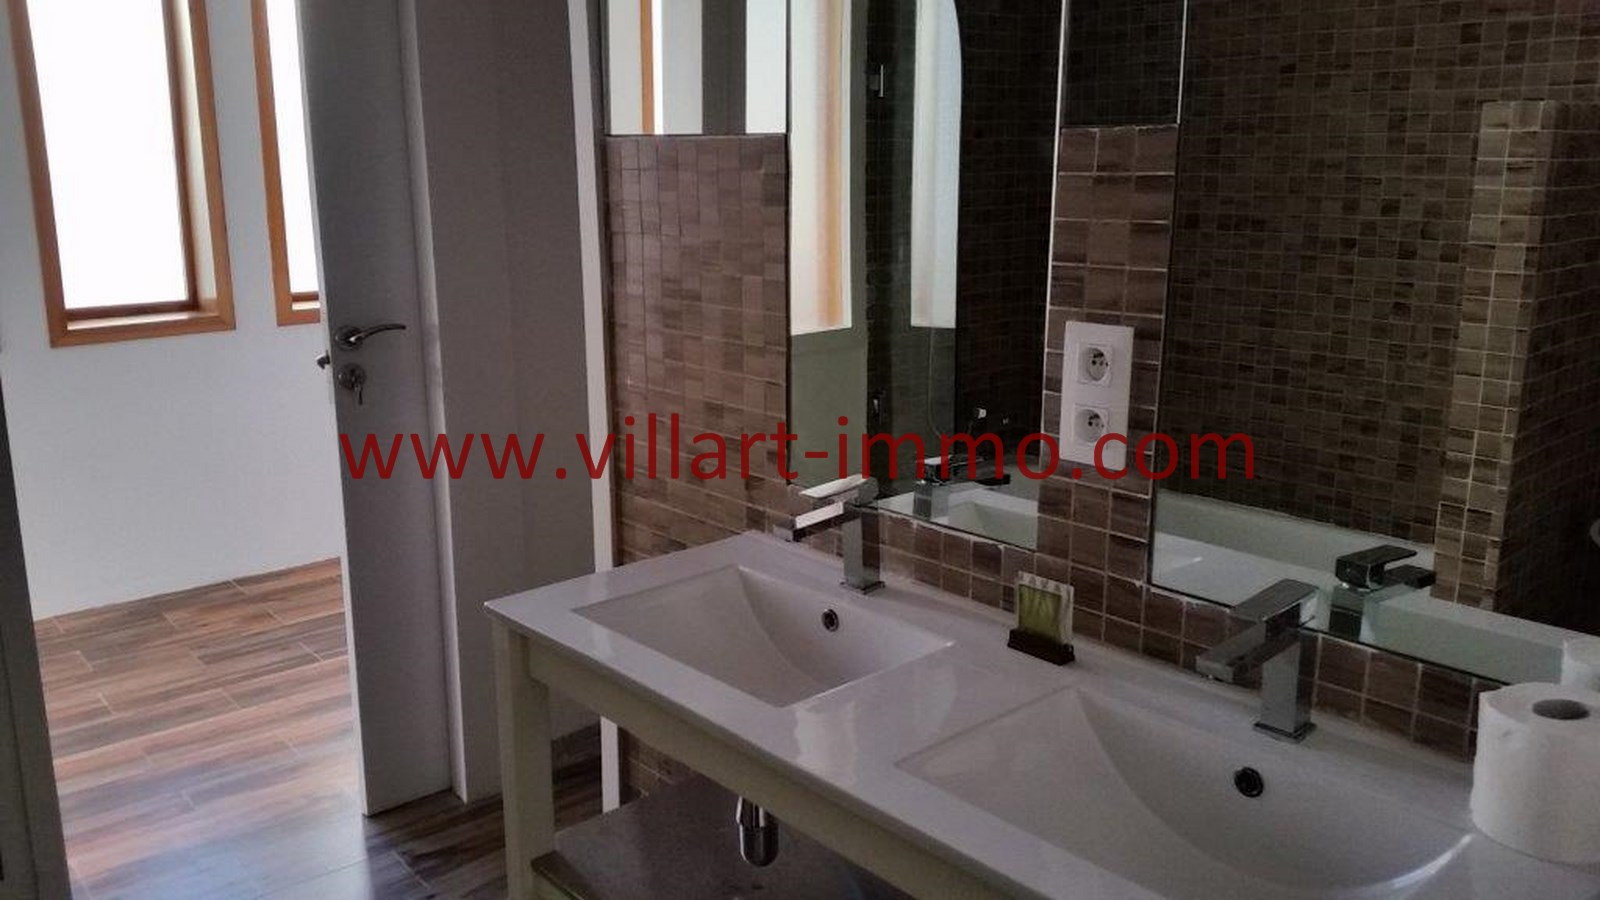 15-Vente-Appartement-Tanger-Centre-De-Ville-Salle de bain 2-VA518-Villart Immo